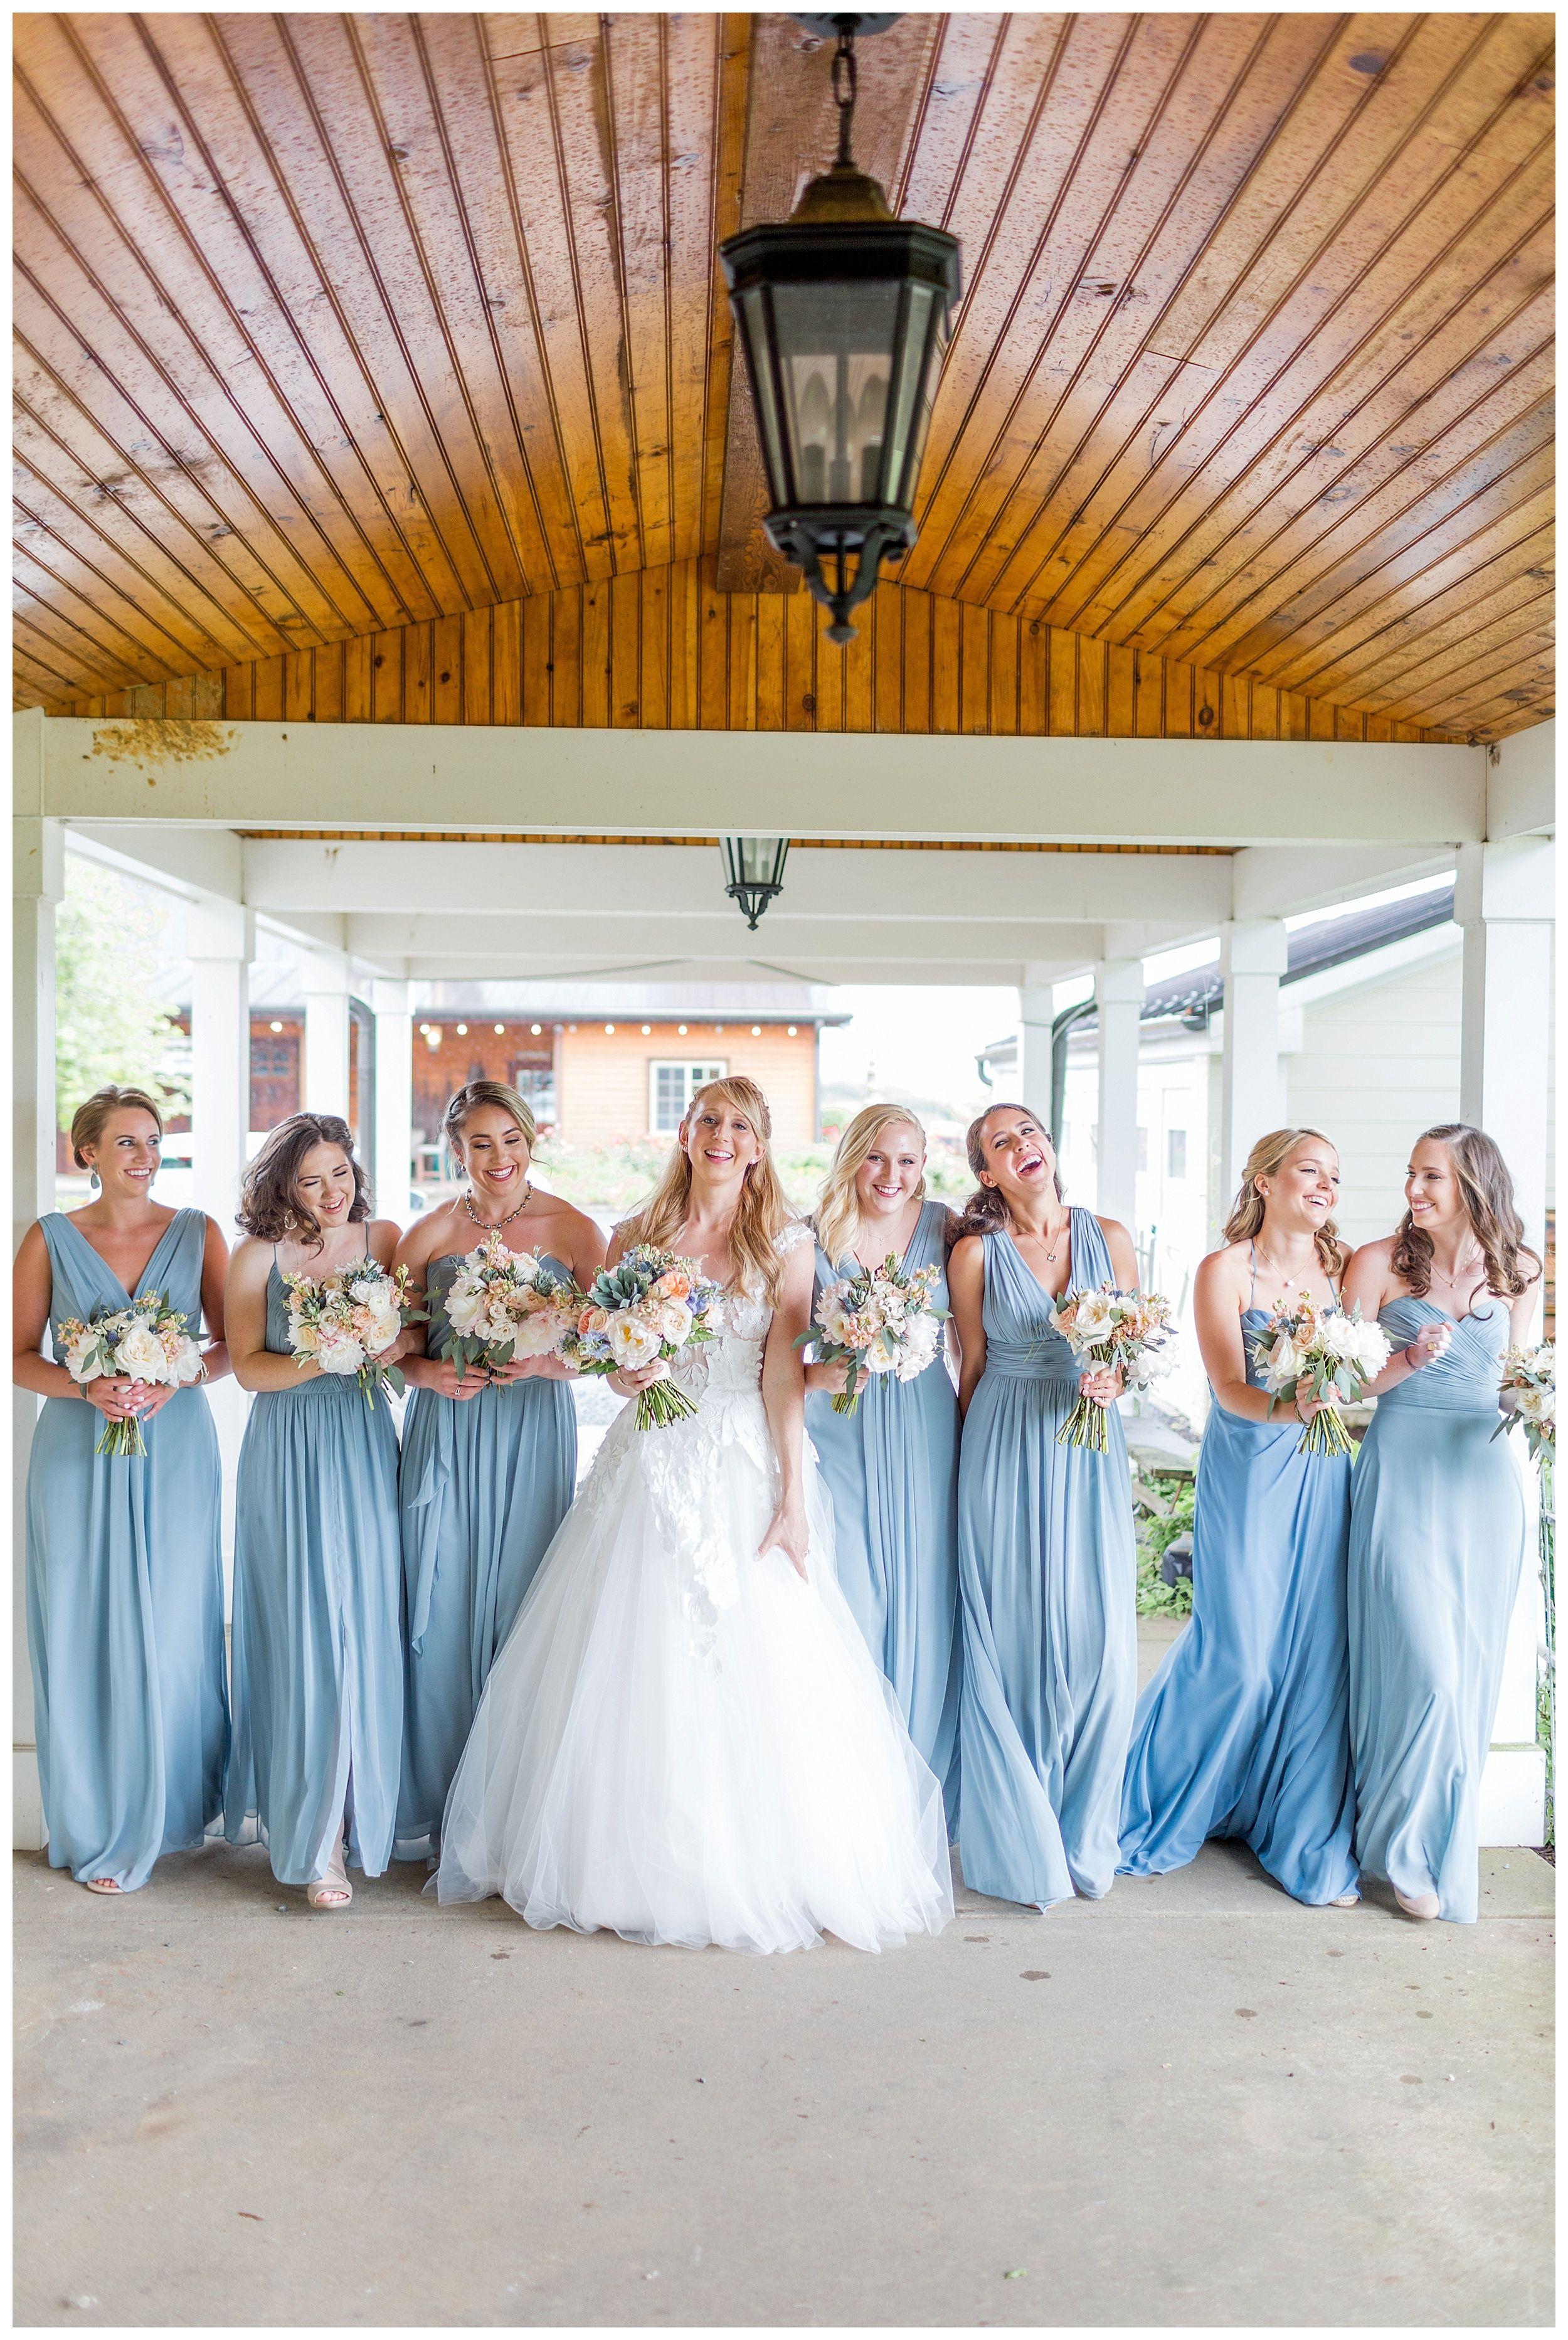 Stone Tower Winery Wedding Virginia Wedding Photographer Kelsey And Brett Kir2ben Com Blue Themed Wedding Spring Bridesmaid Dresses Wedding [ 3730 x 2500 Pixel ]